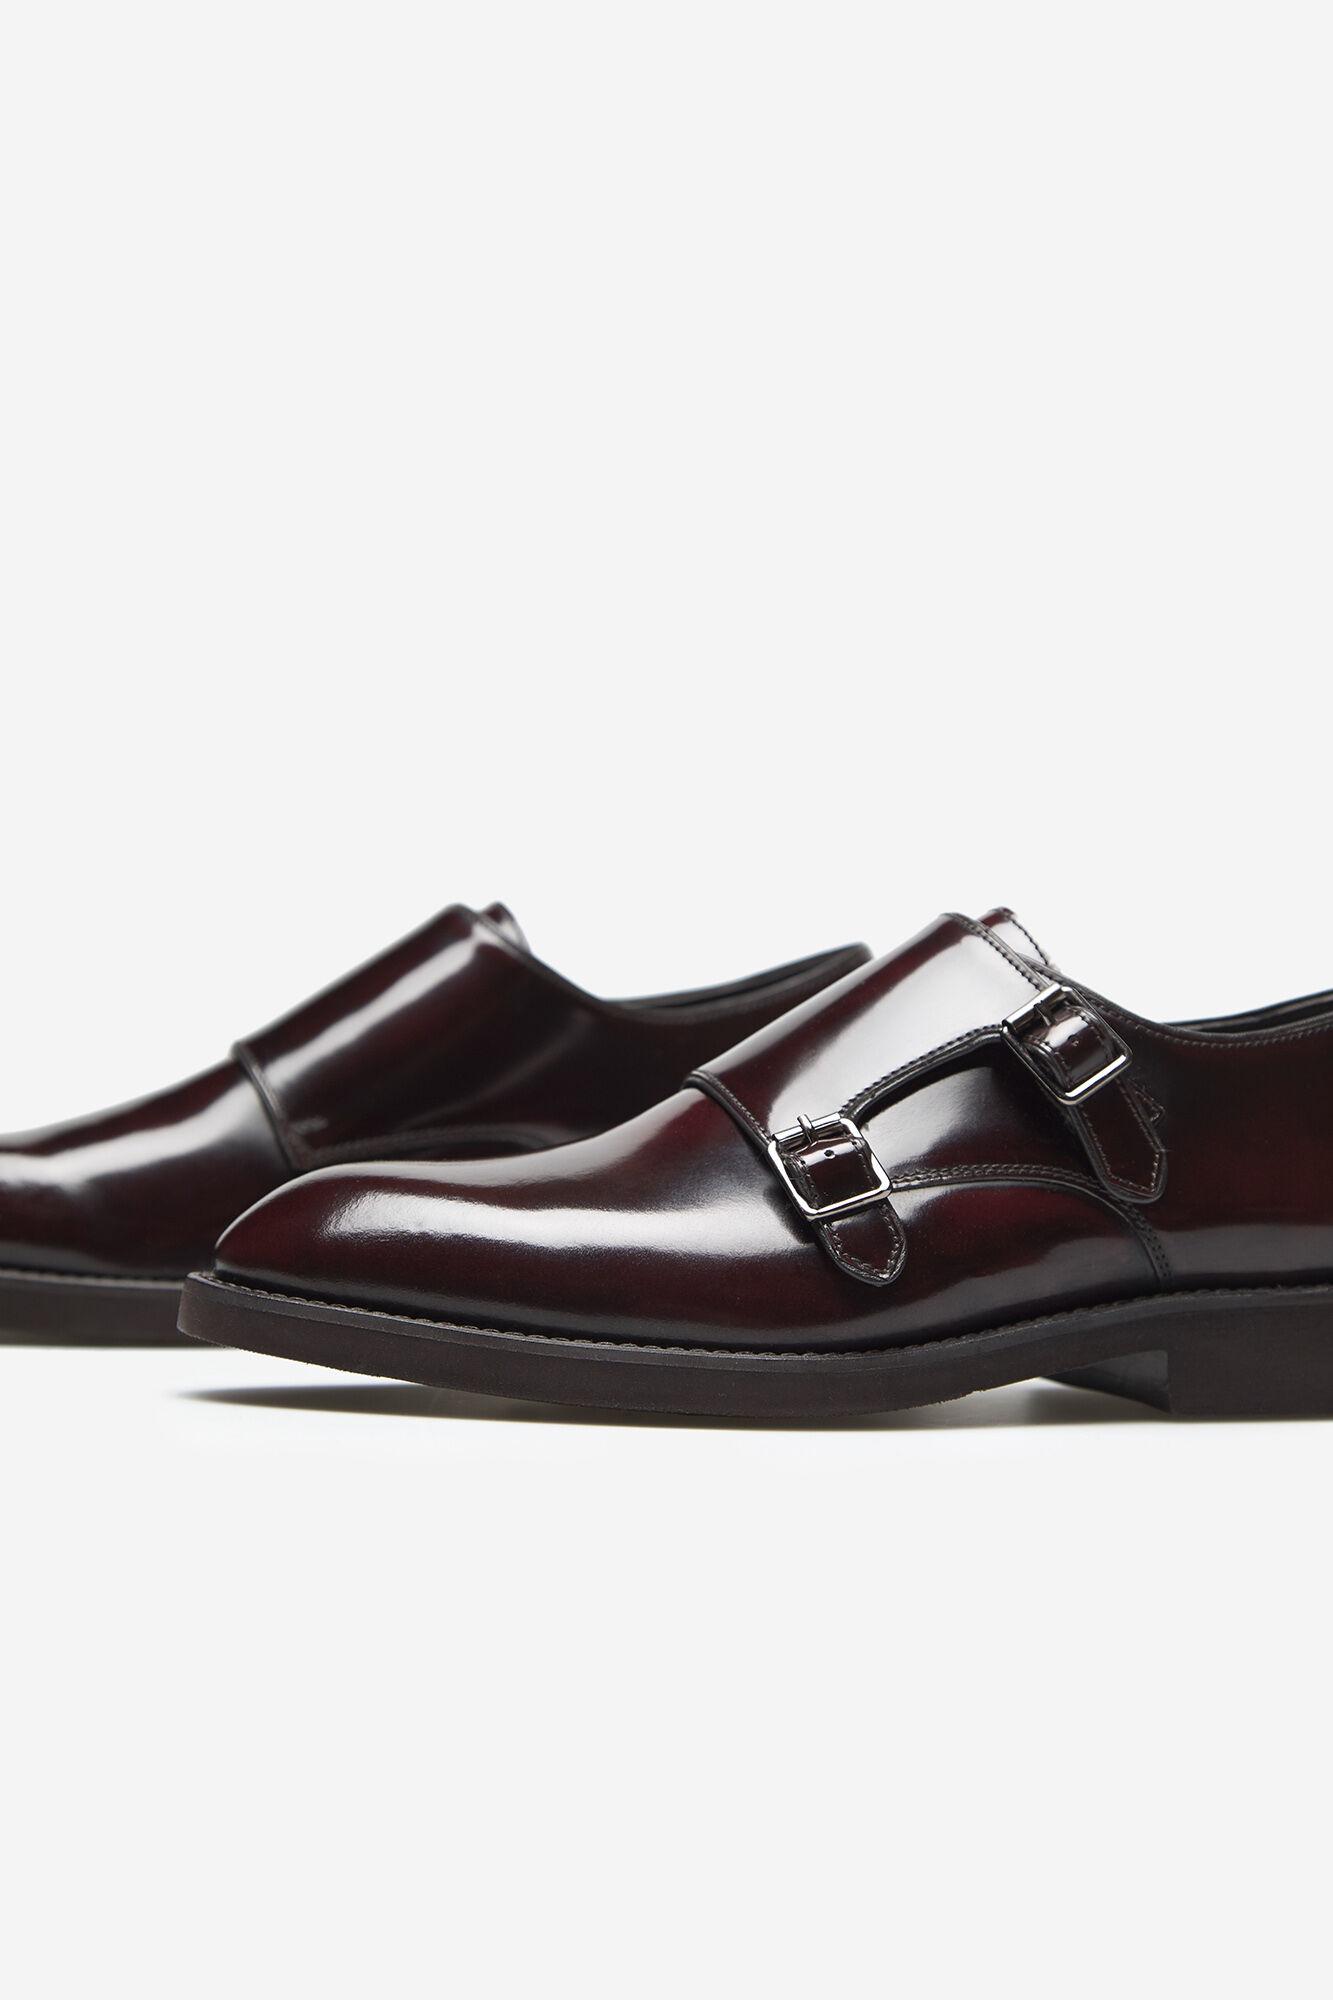 Sapato vestir 2 fivelas sola em borracha | Sapatos | Cortefiel